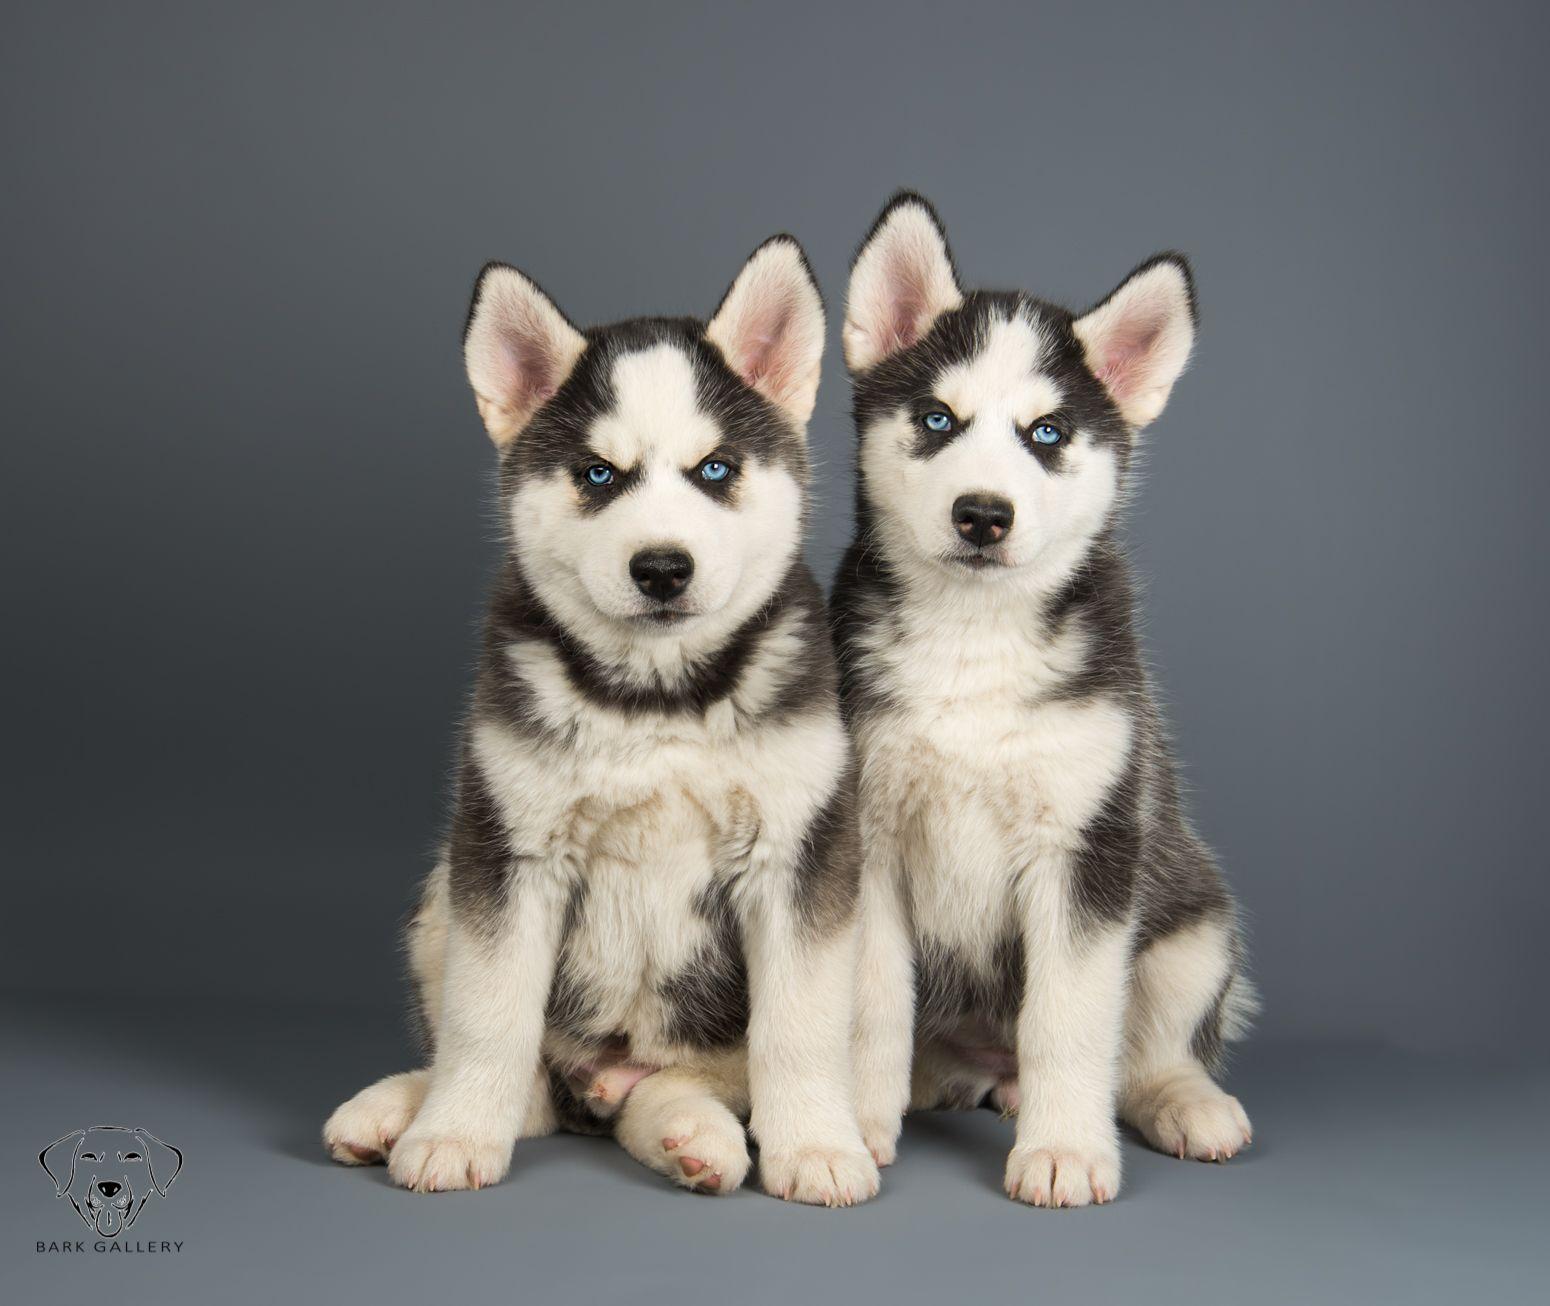 Husky Puppies Bark Gallery Session Las Vegas Photography Husky